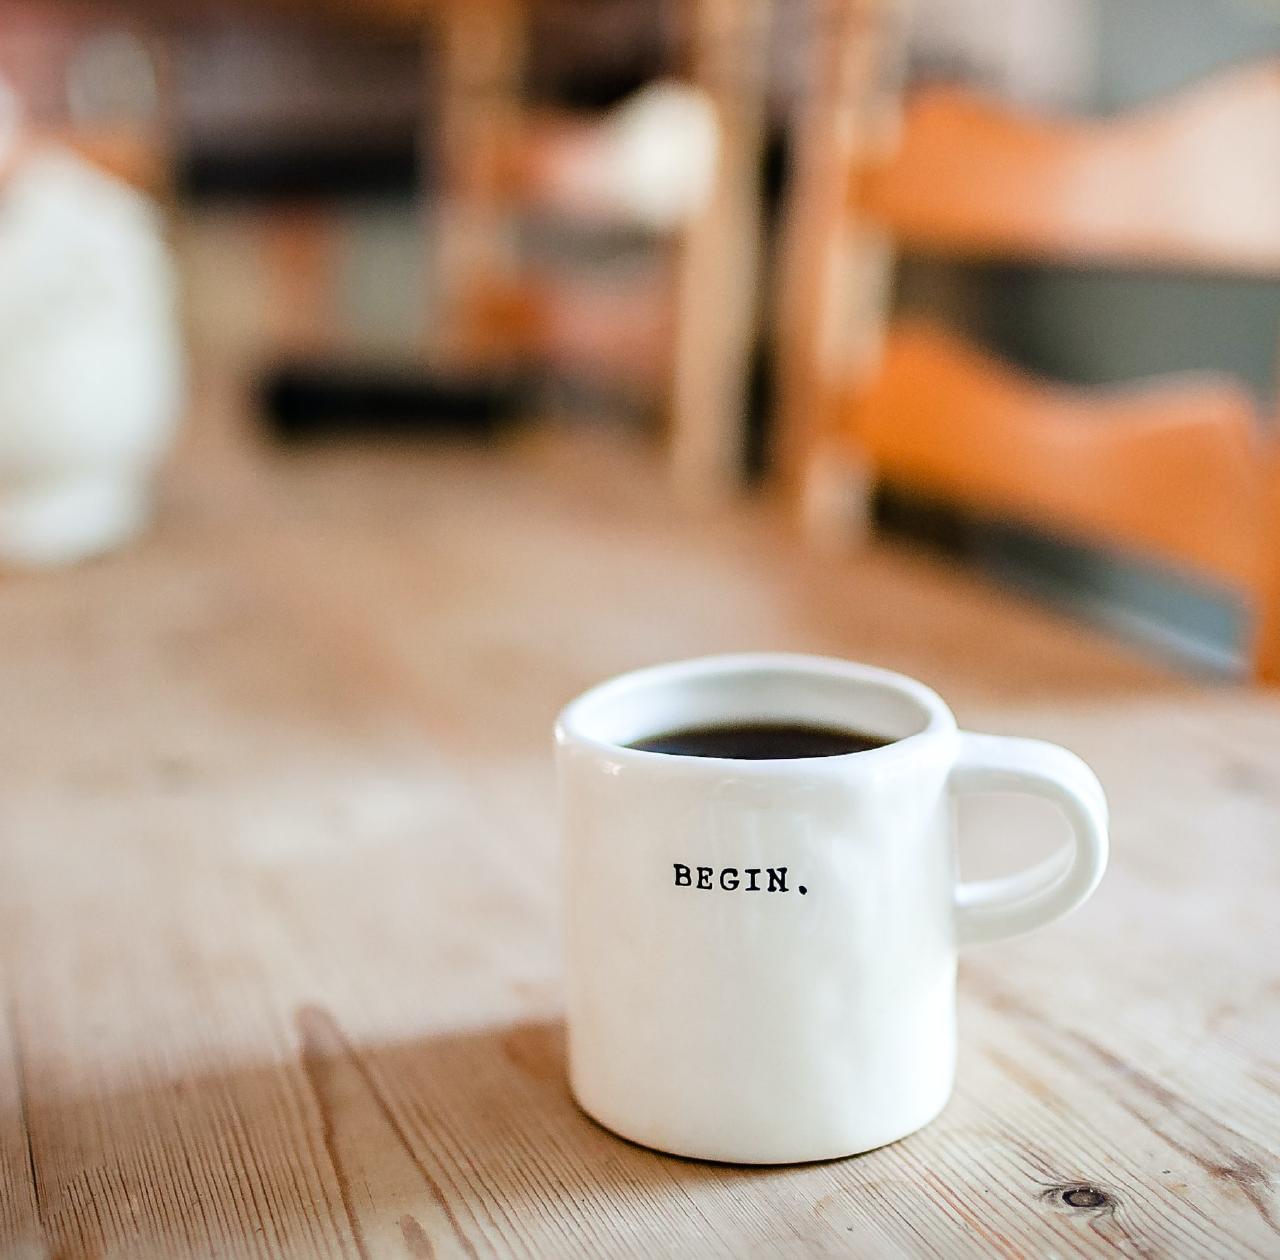 https://bigfishfinancialservices.com/wp-content/uploads/2021/01/Coffee-Cup-1280x1260.png